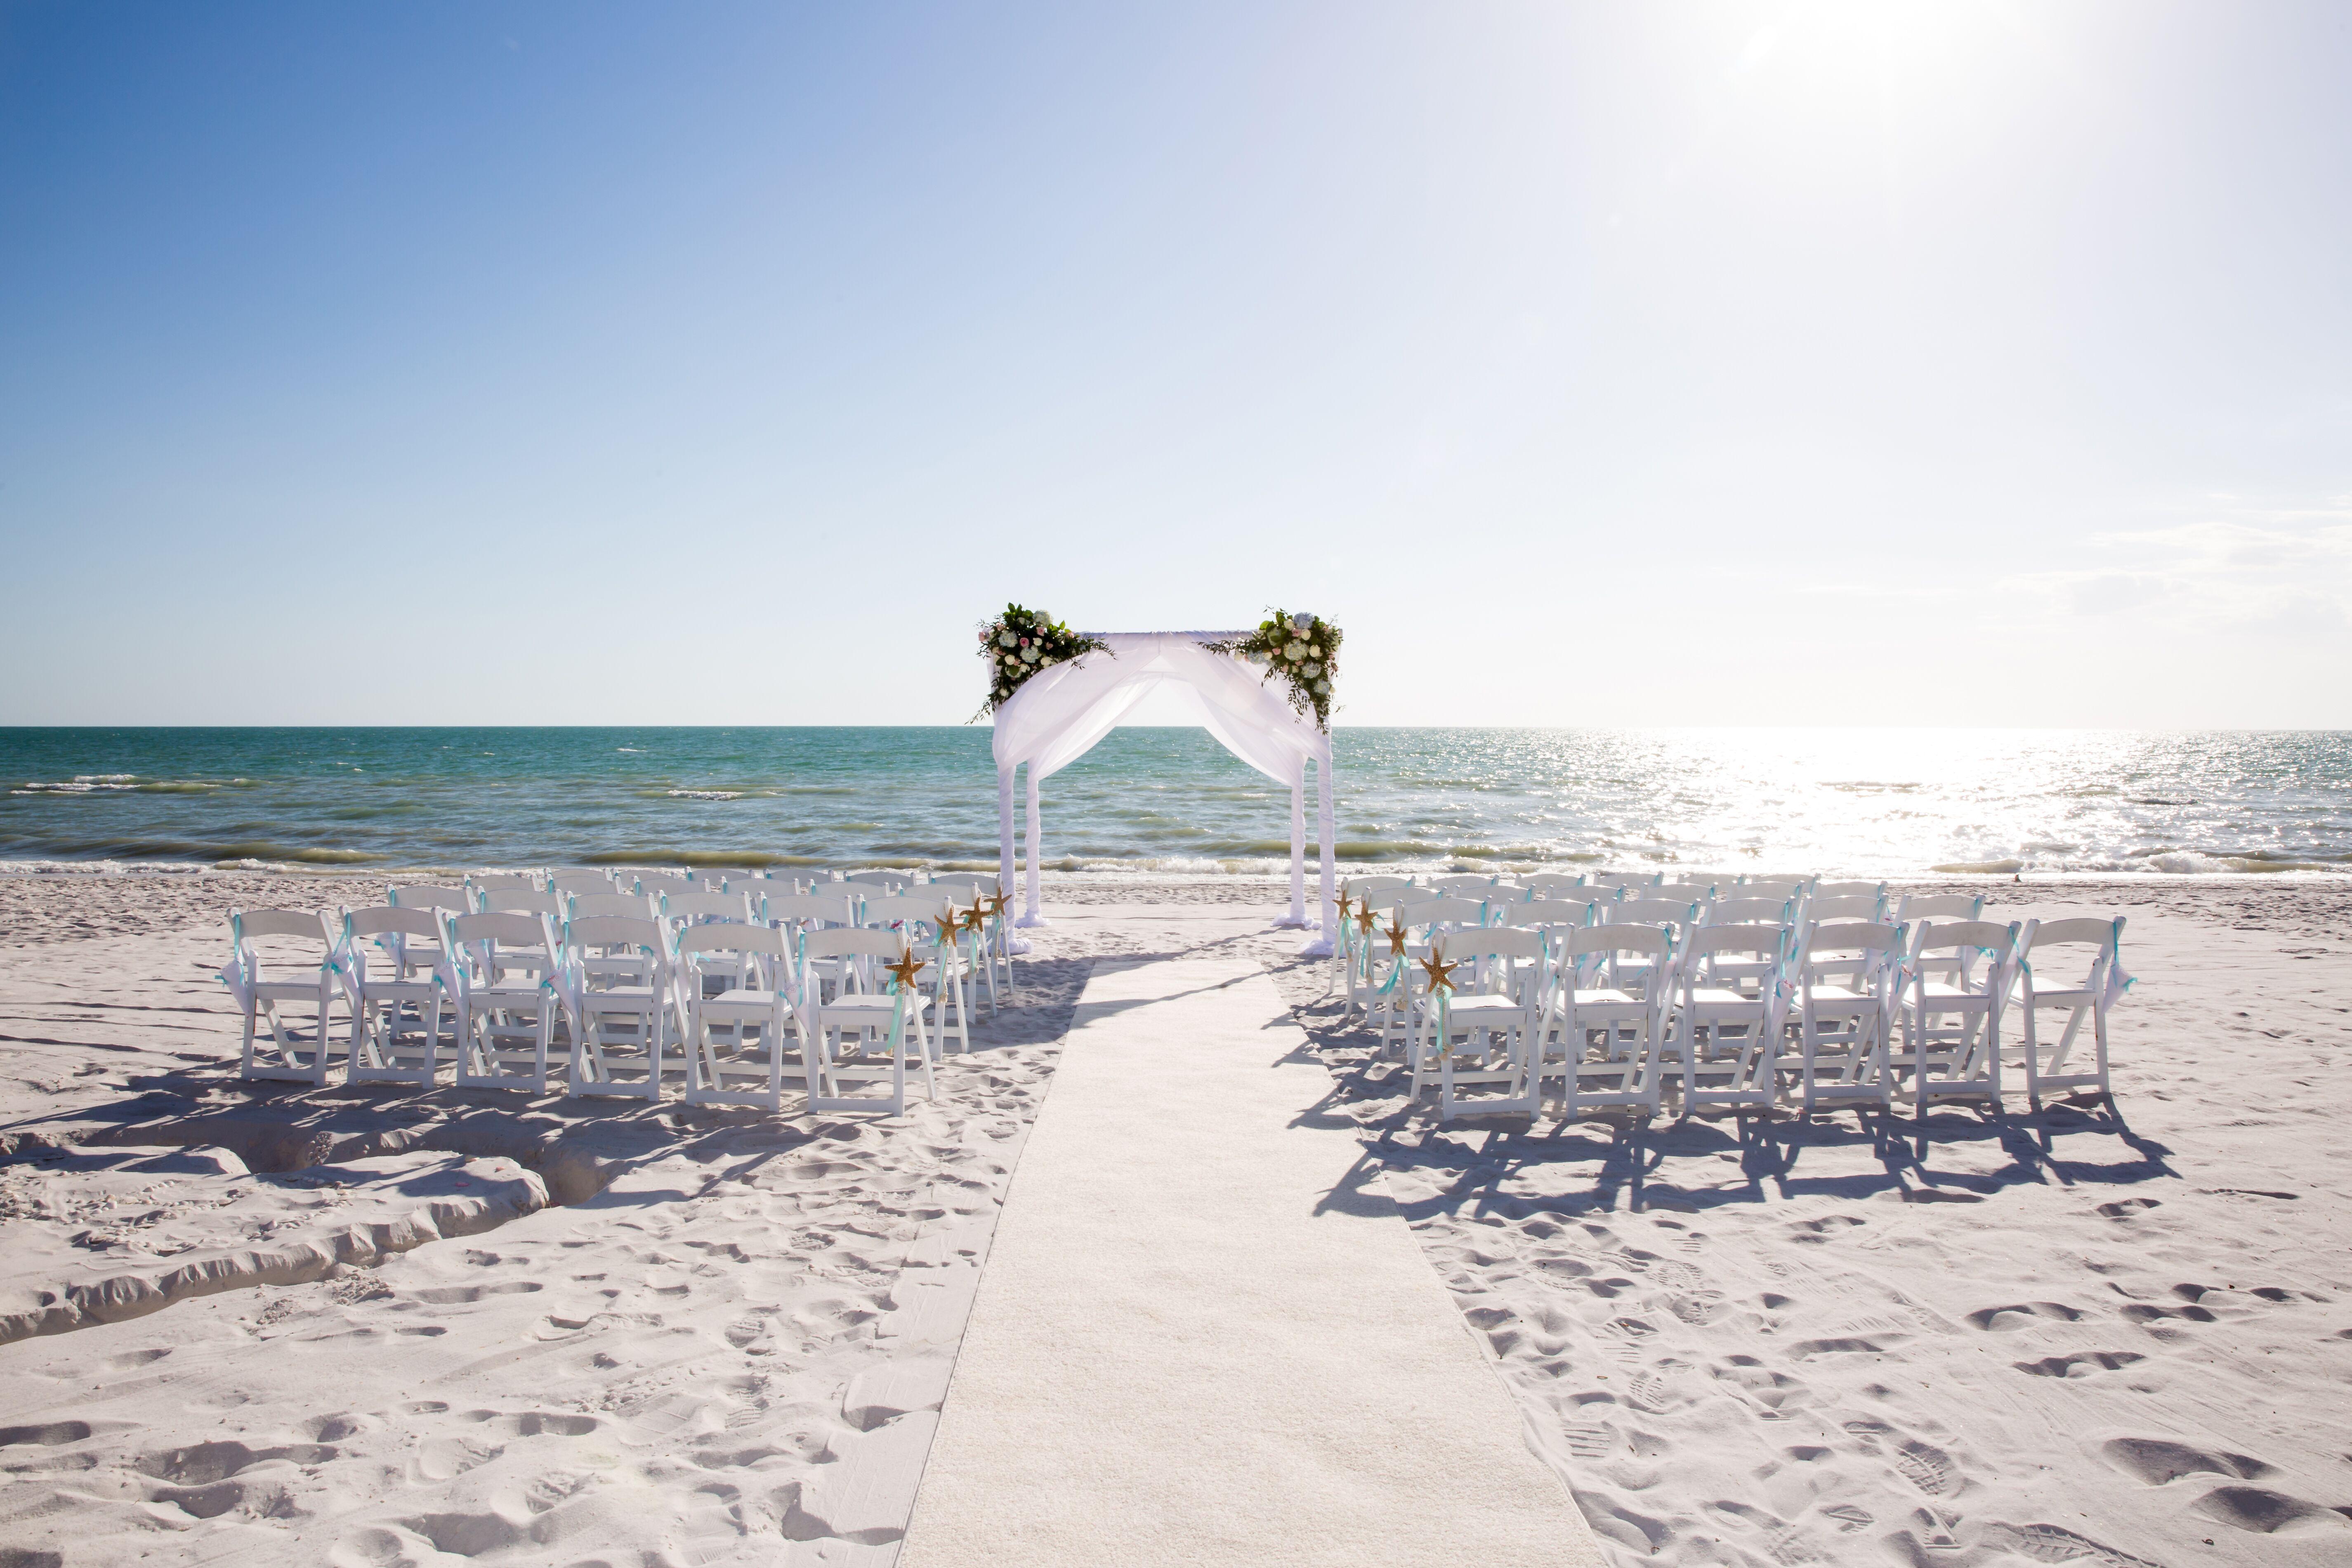 White Beach Ceremony At The Ritz-Carlton, Naples